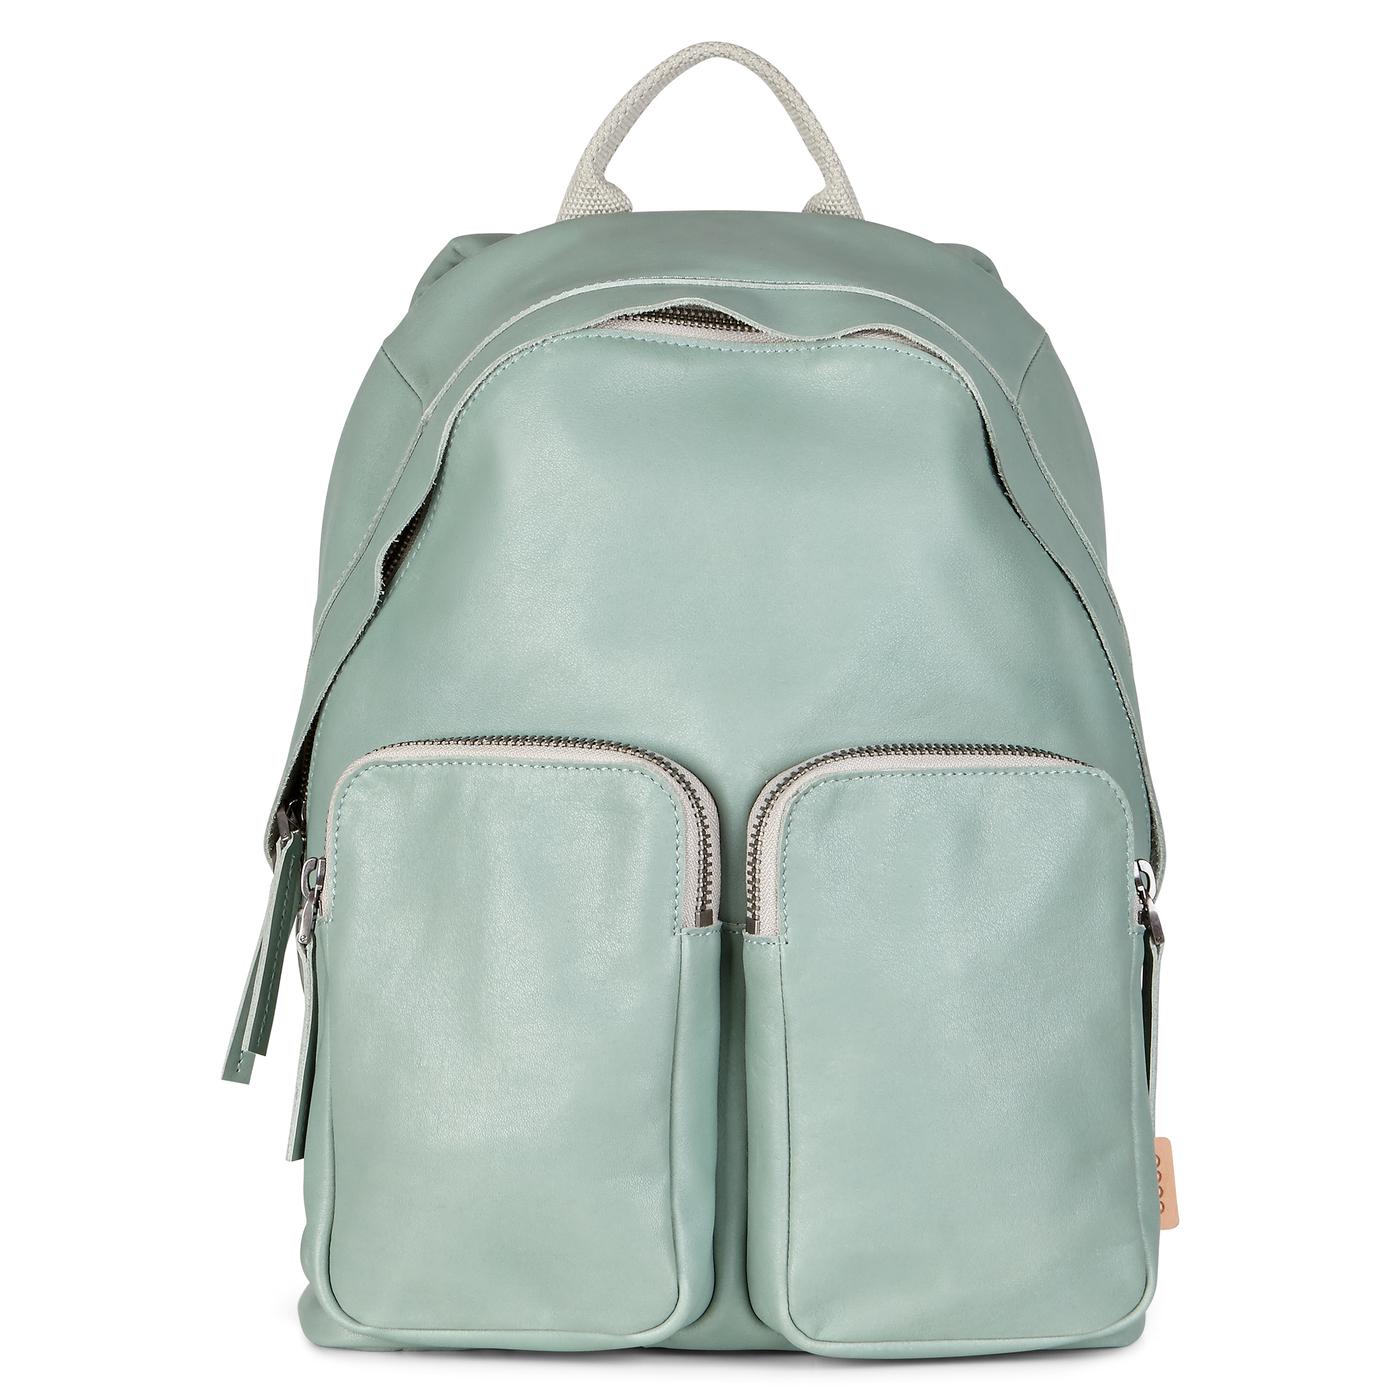 ECCO CASPER Small Backpack Soft Leather